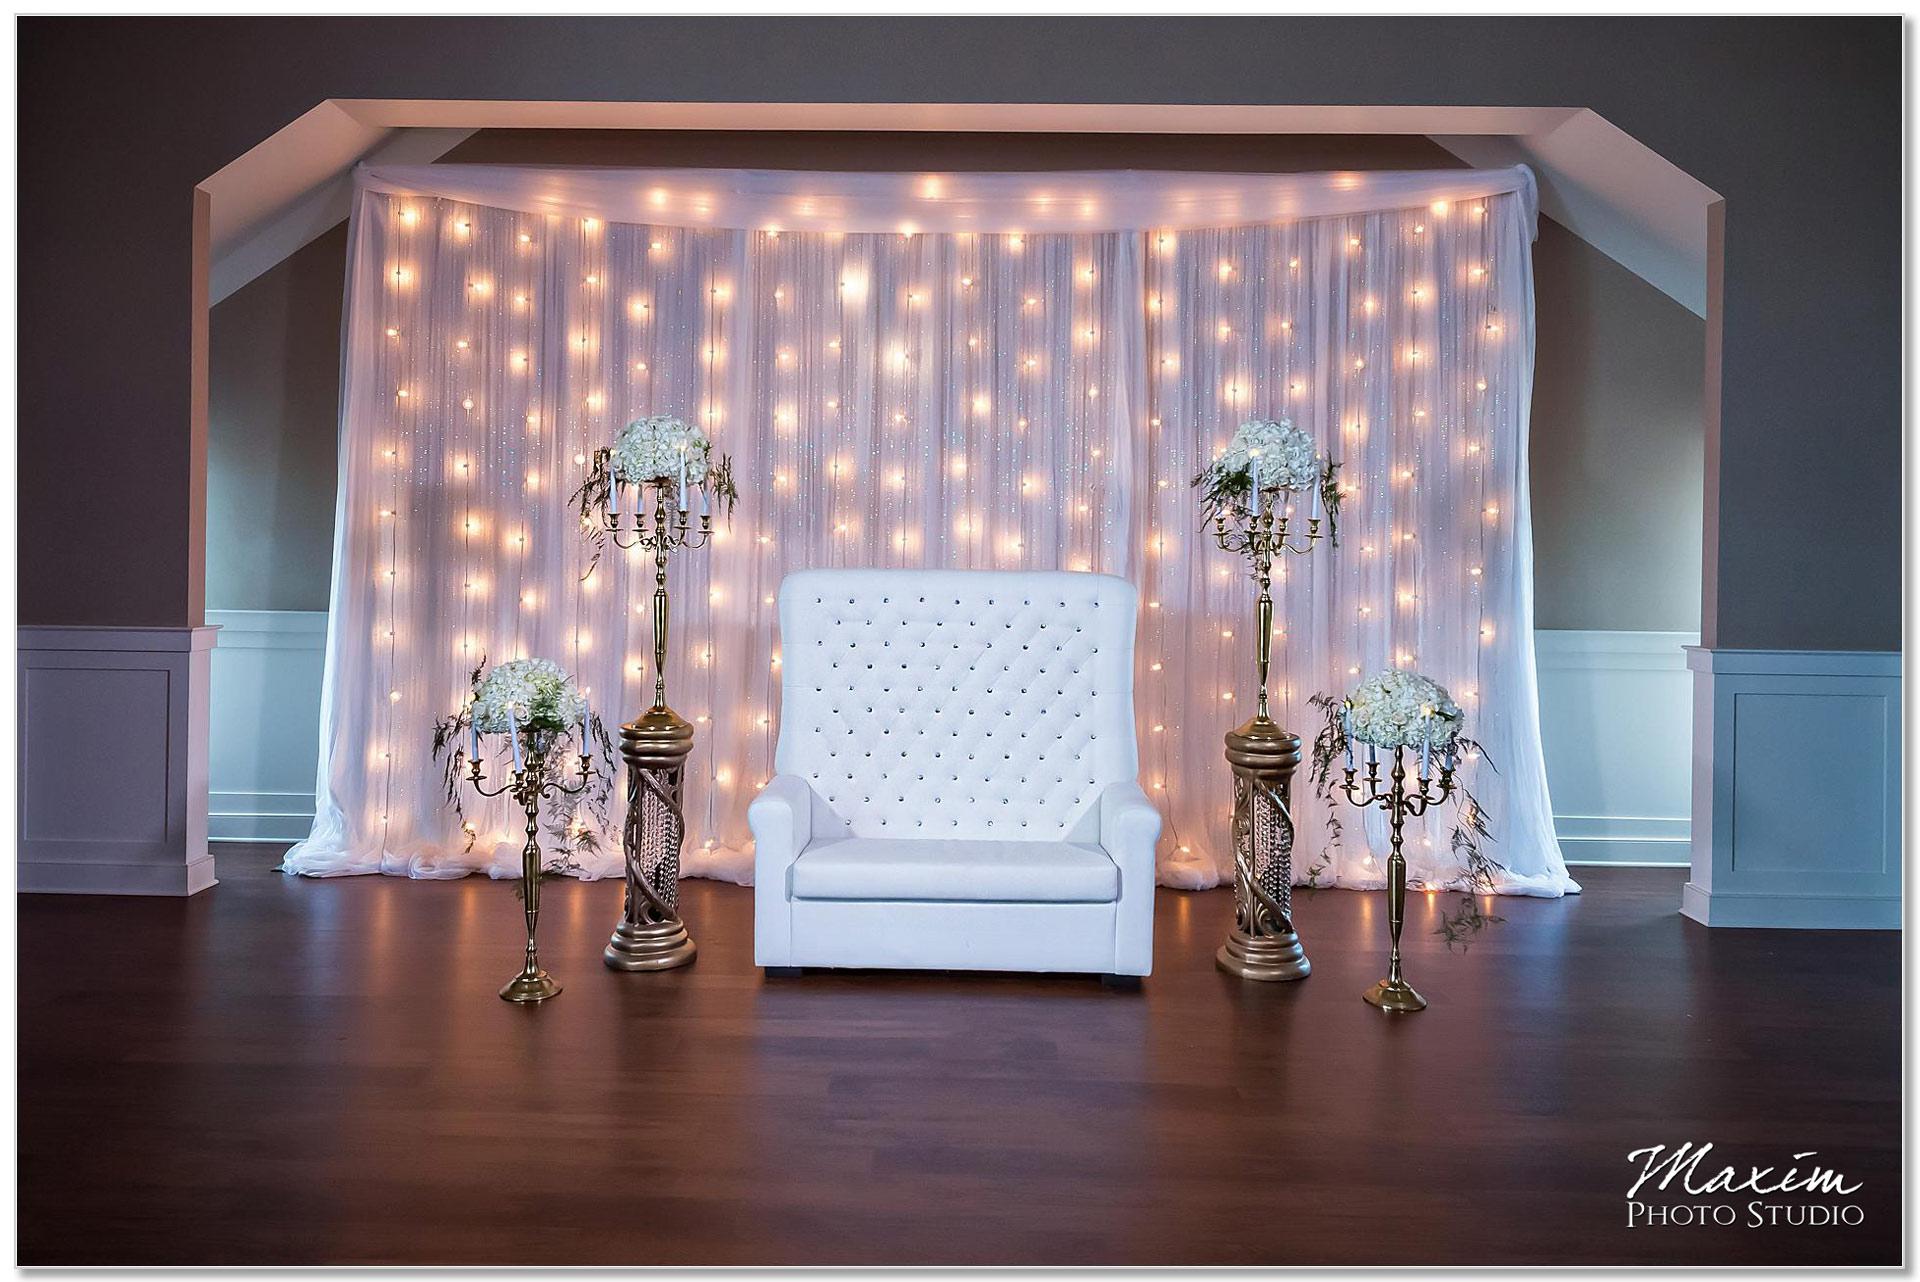 Centre Park West Holiday Inn Wedding Decor ceremony